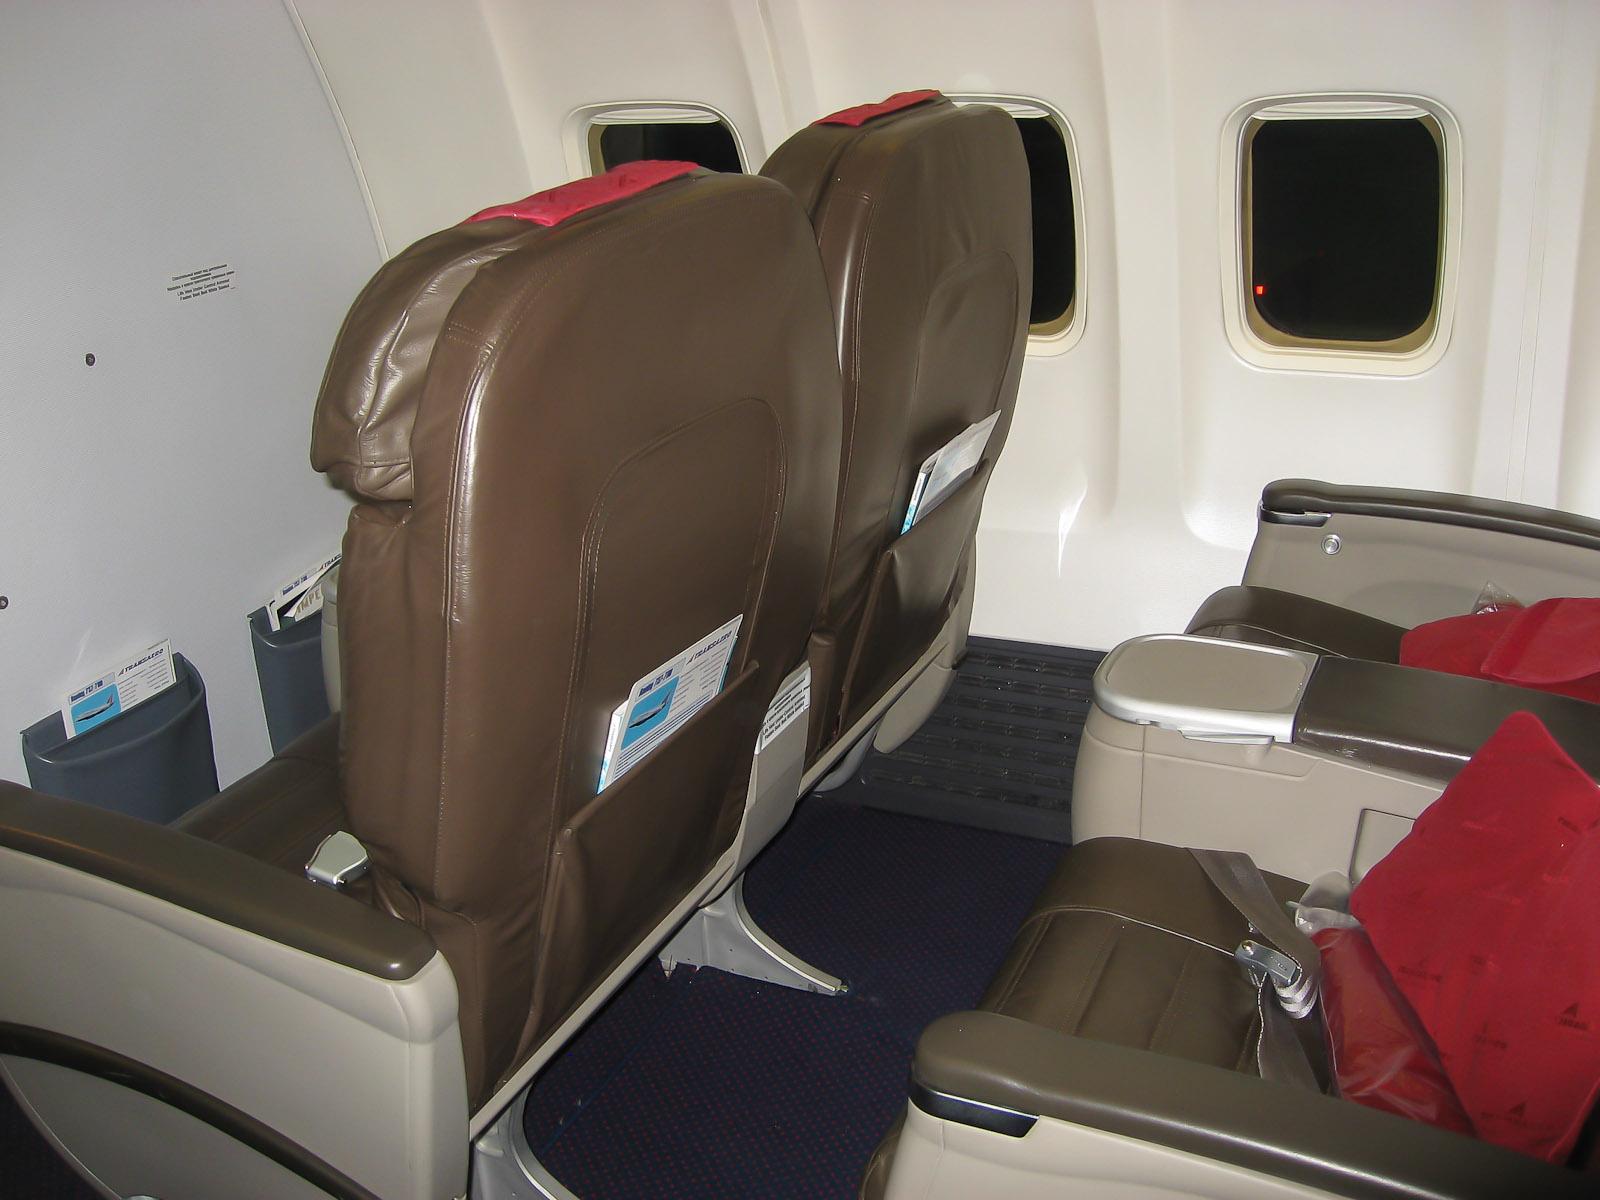 Бизнес-класс в самолете Боинг-737-700 EI-RUL авиакомпании Трансаэро